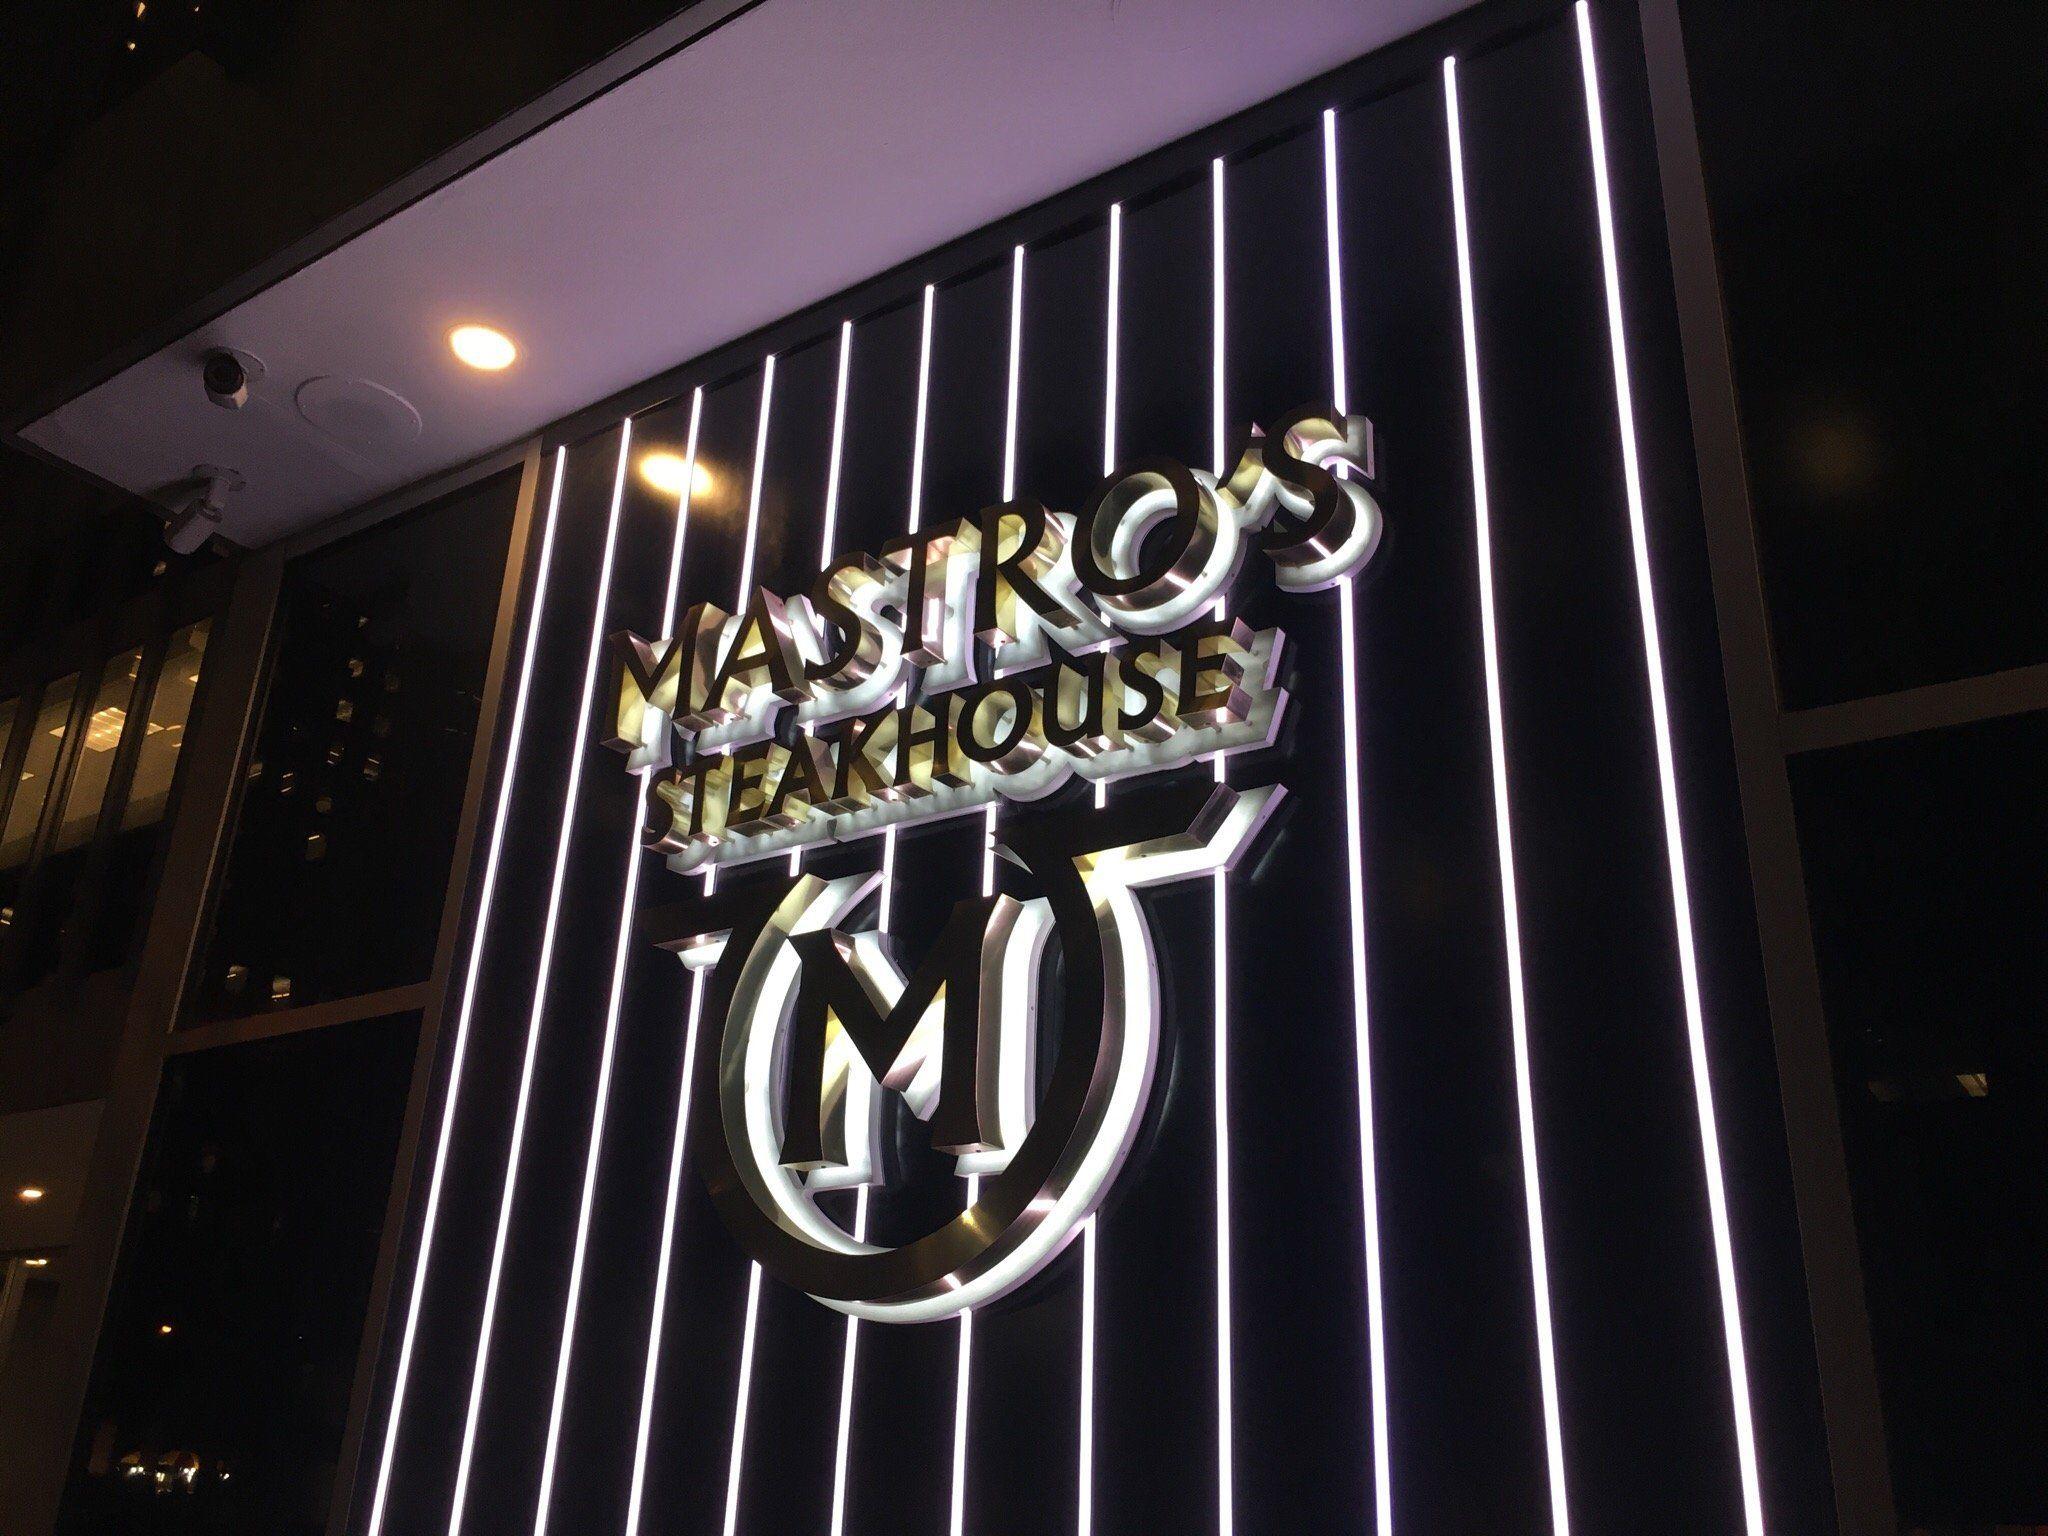 Mastro S Steakhouse New York City Midtown Restaurant Reviews